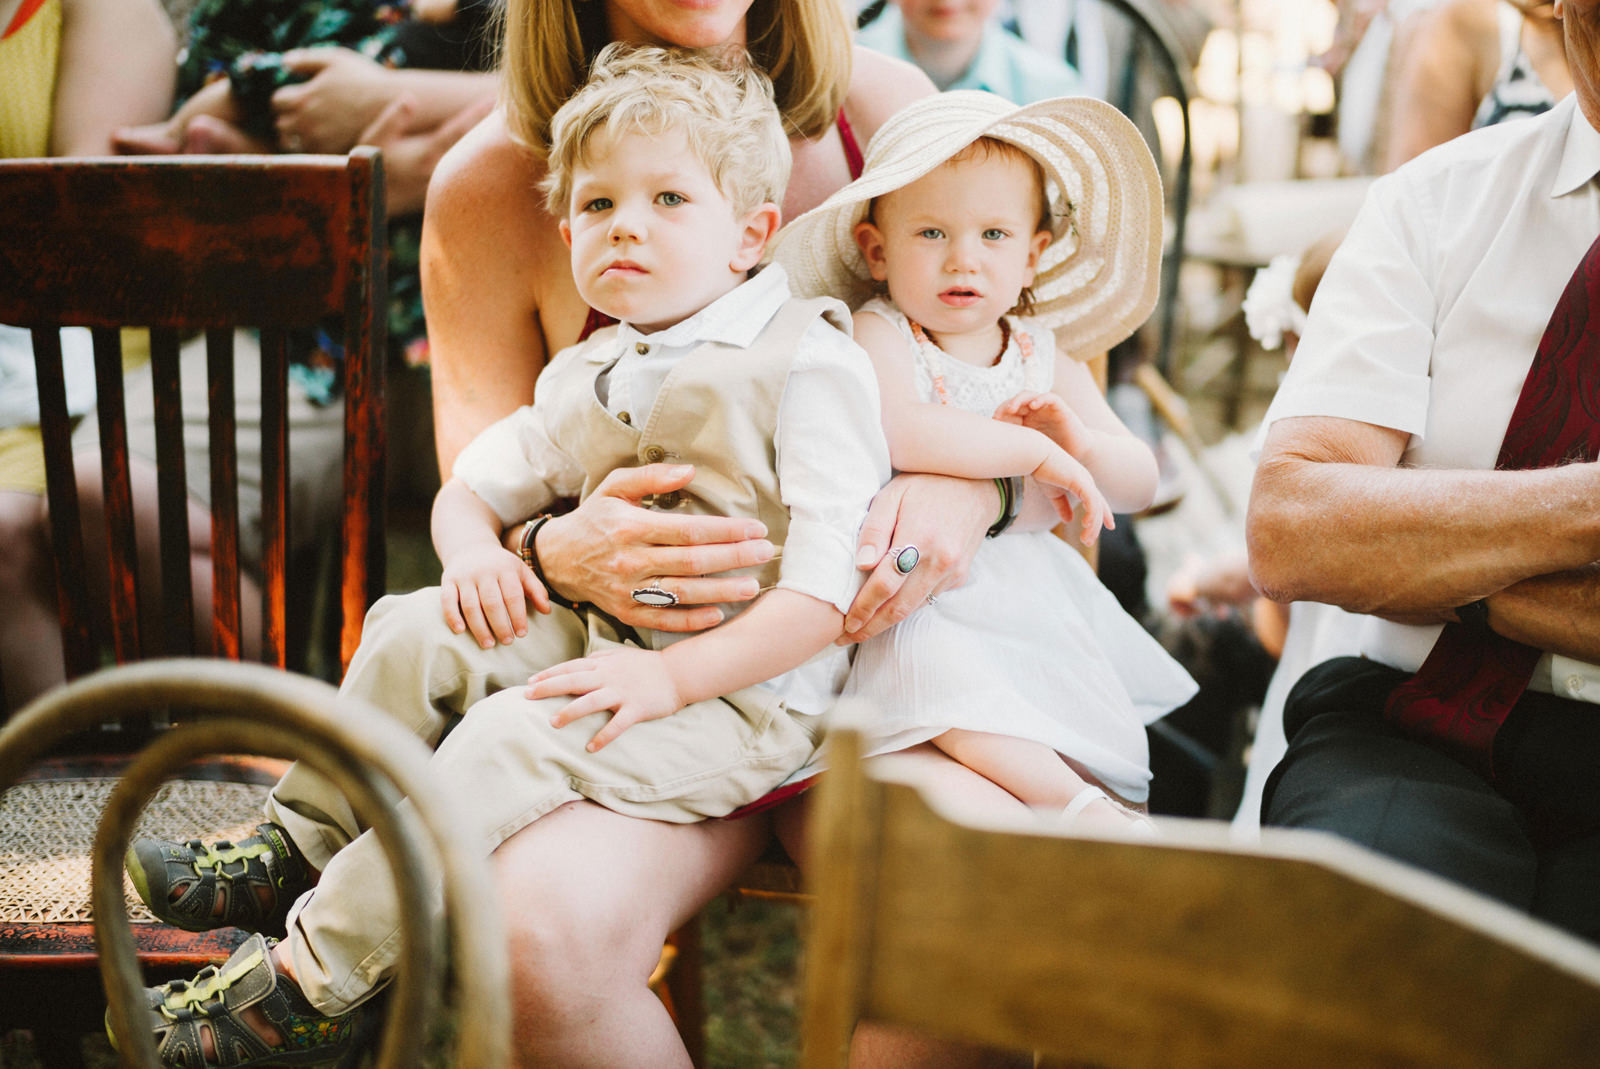 rivers-bend-retreat-wedding-016 RIVER'S BEND RETREAT WEDDING